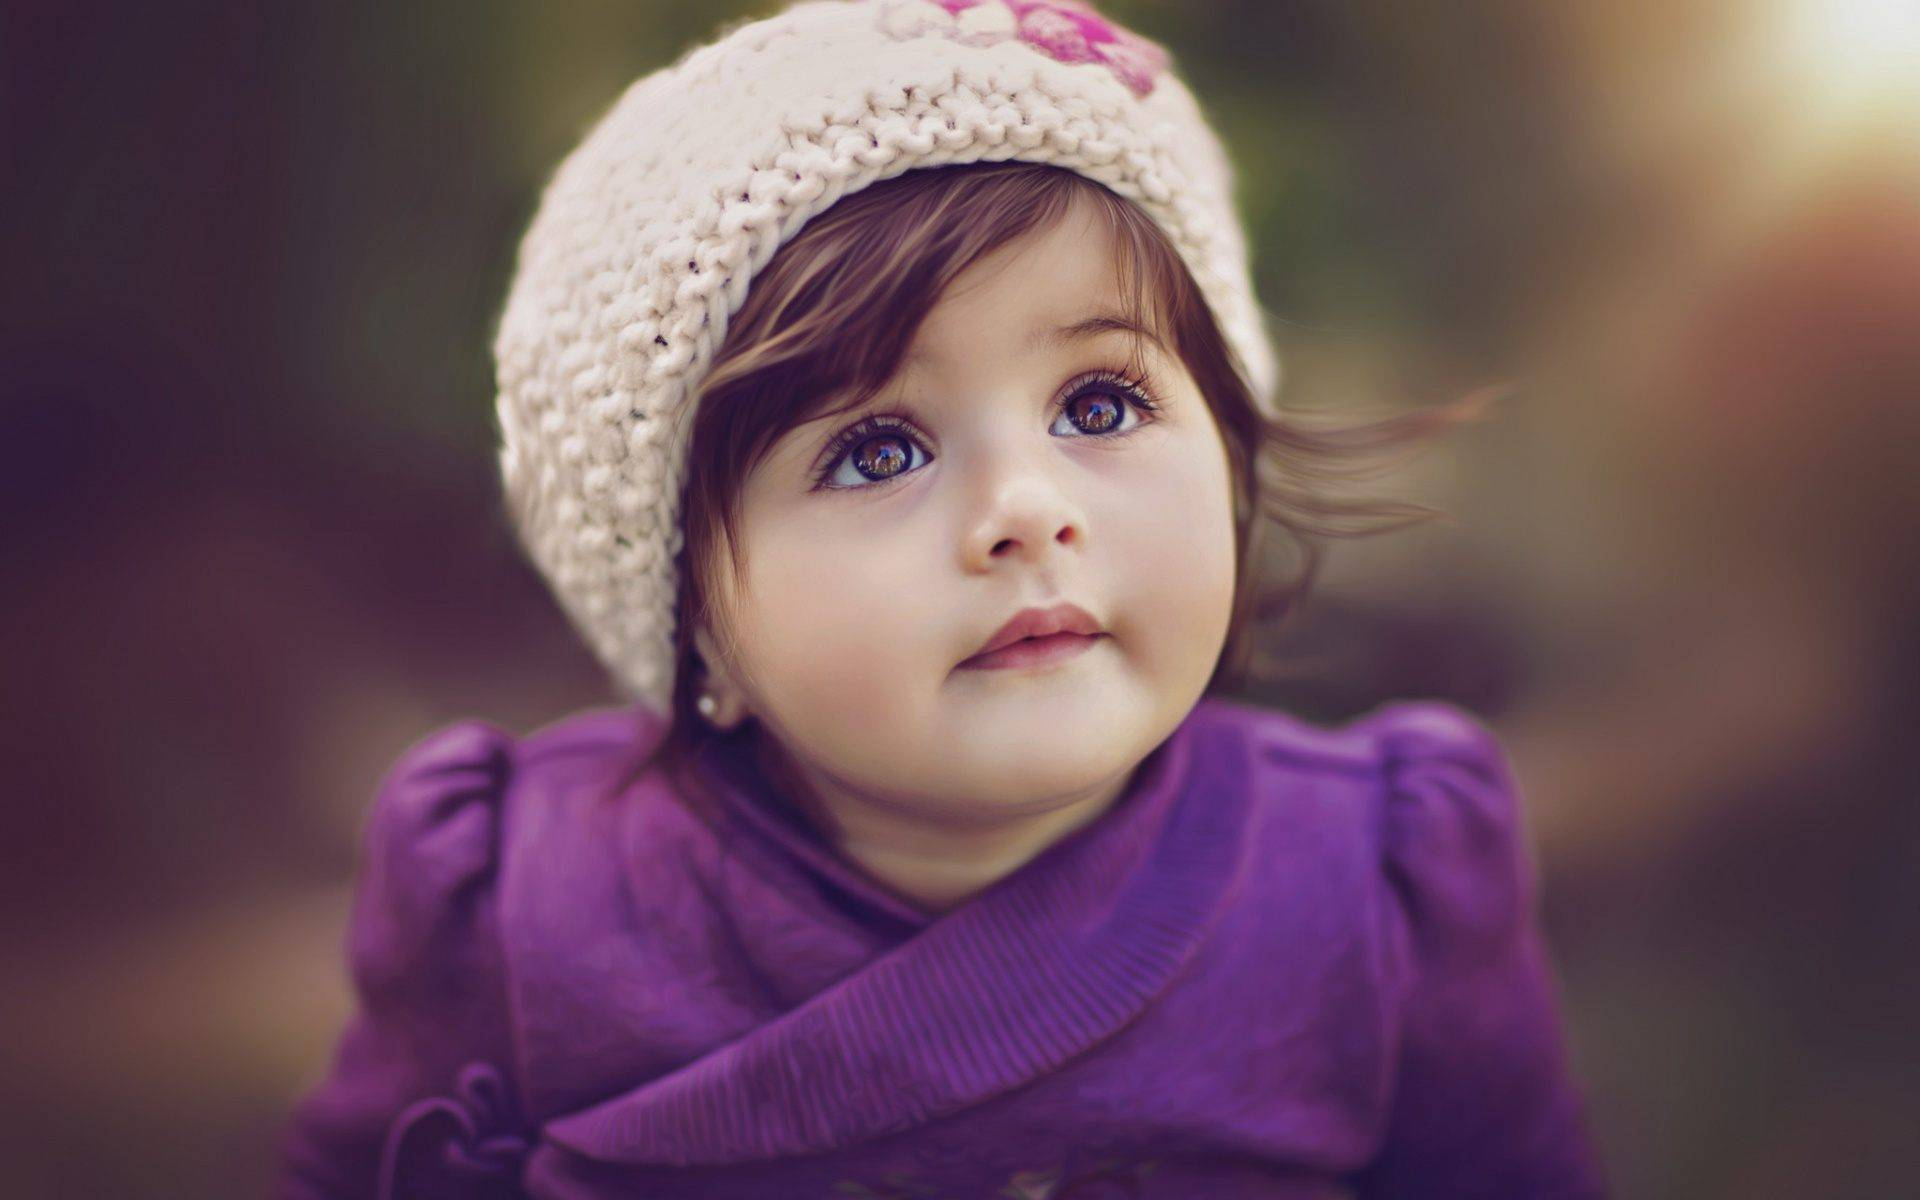 صورة صور بنات صغار حلوين , اروع صور اطفال بنات